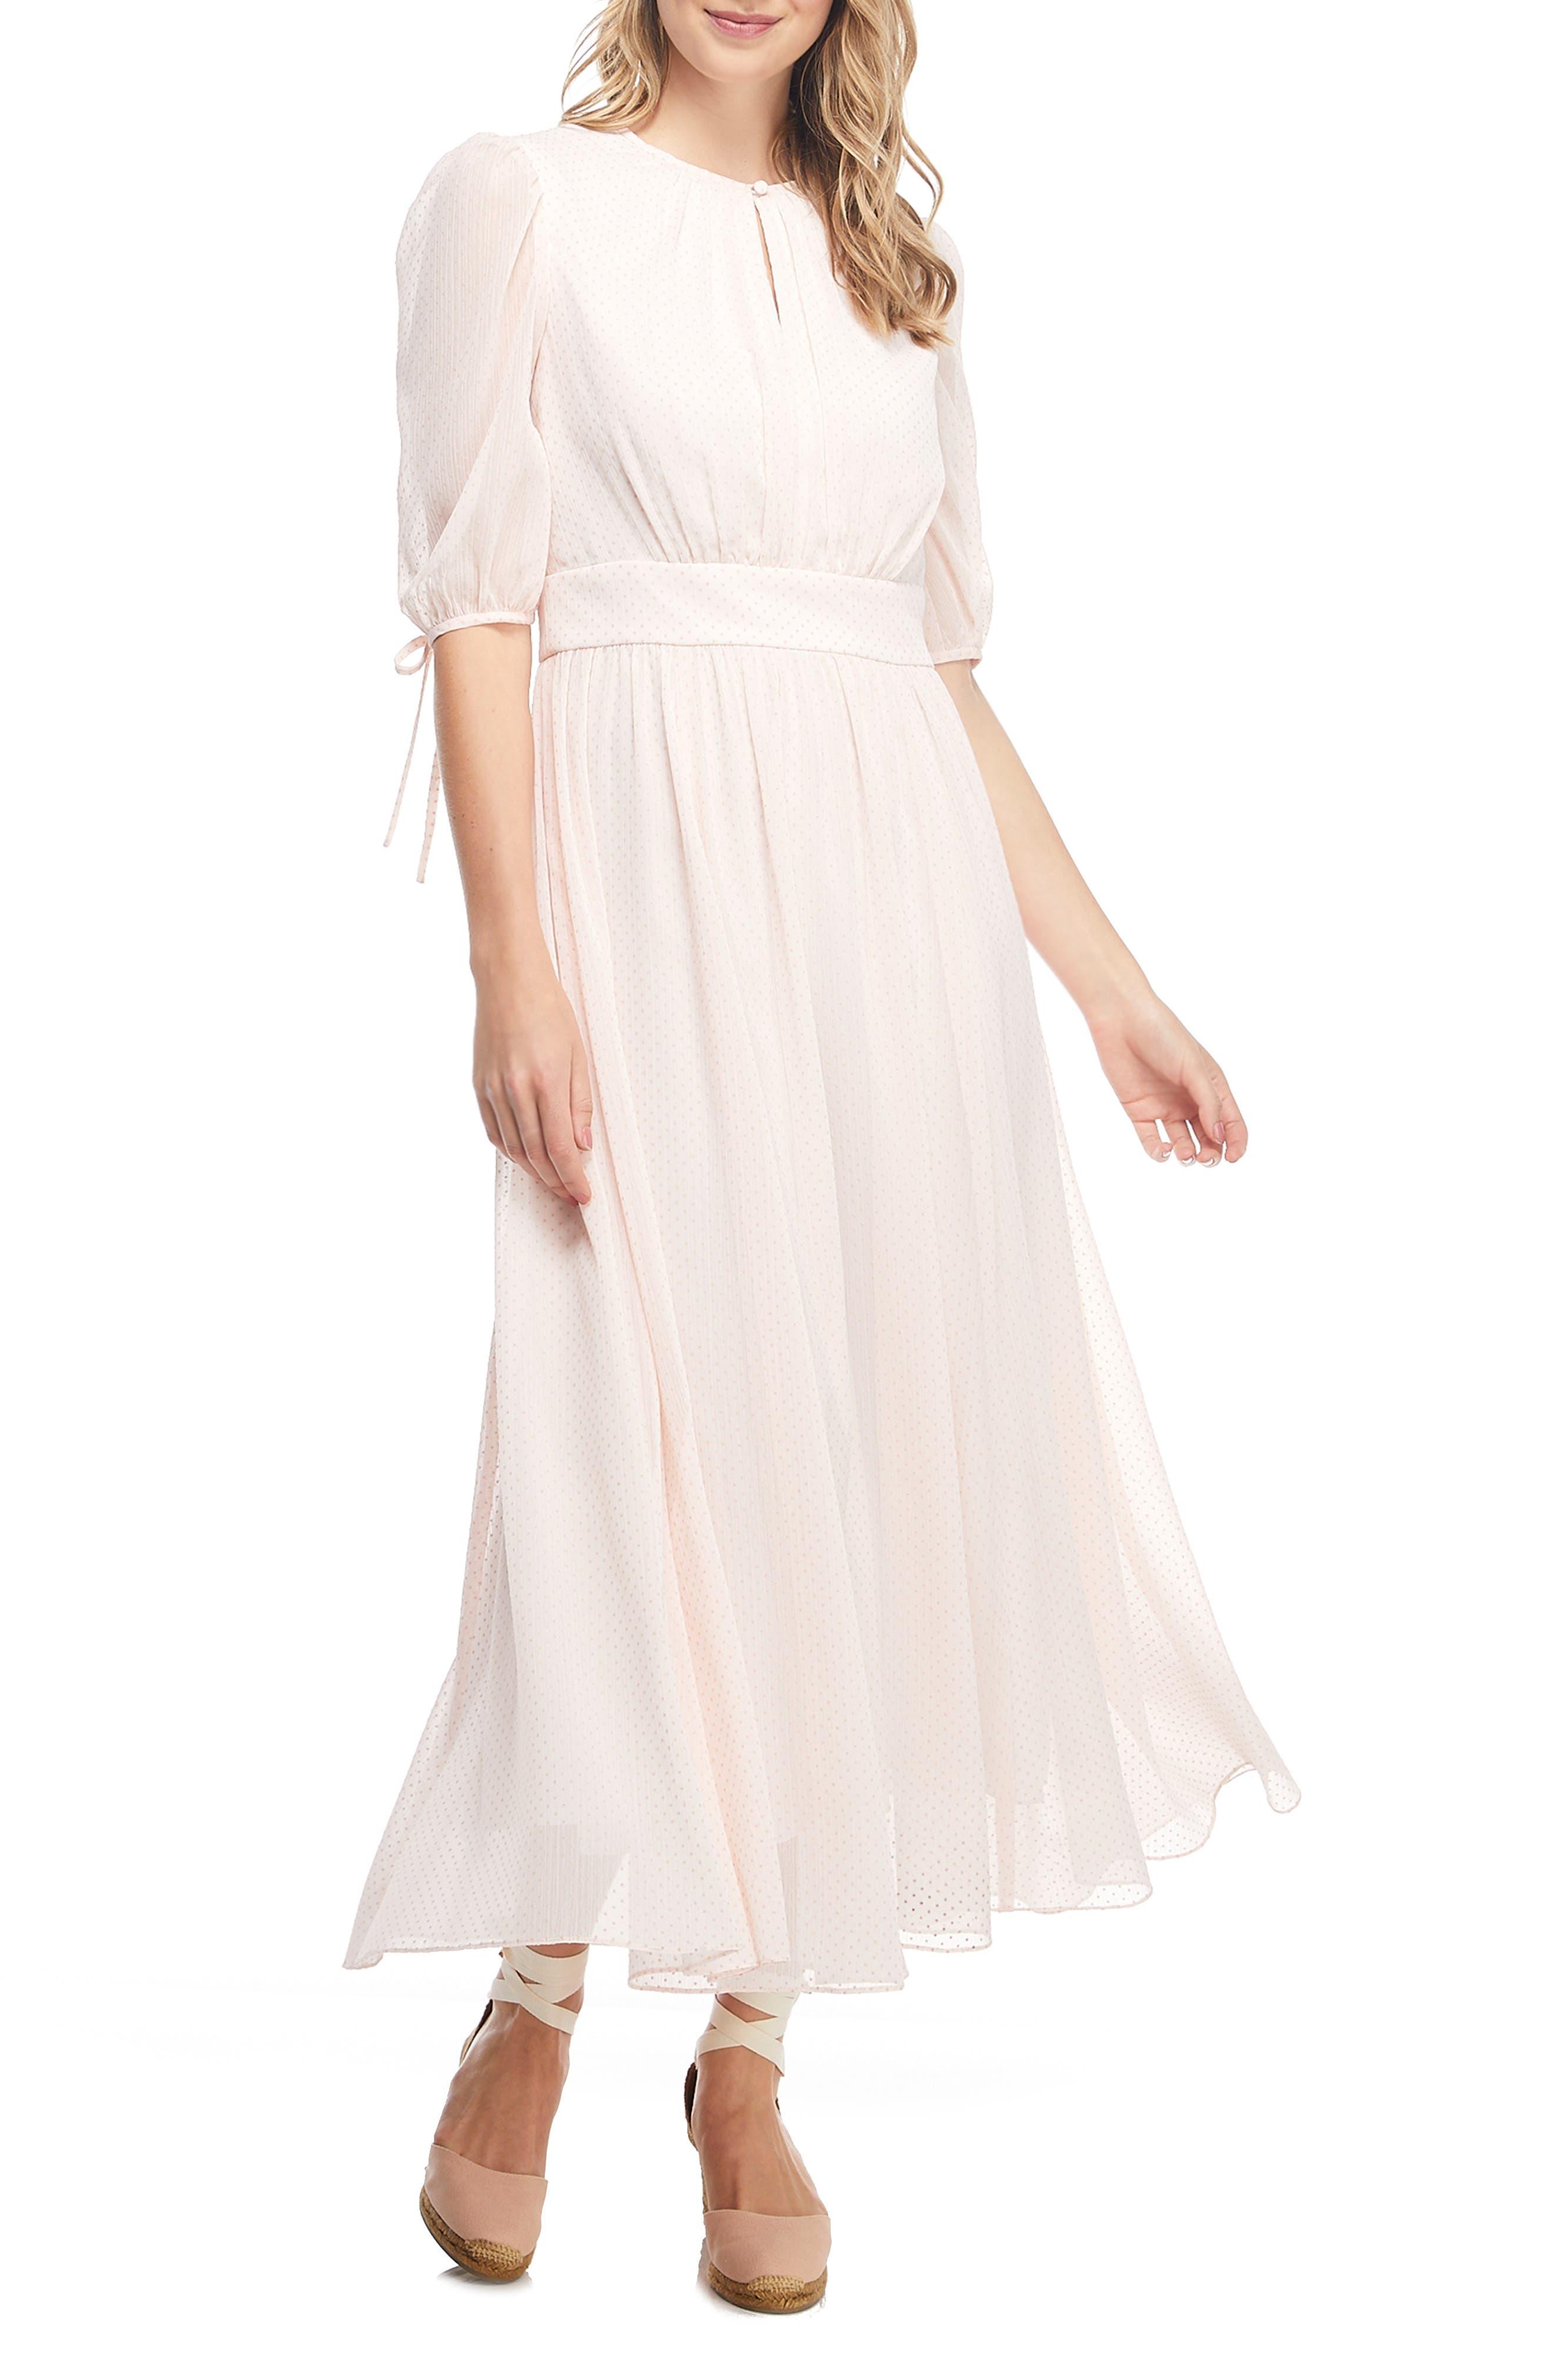 70s Dresses – Disco Dresses, Hippie Dresses, Wrap Dresses Womens Gal Meets Glam Collection Louise Mini Dot Flared Dress $112.80 AT vintagedancer.com